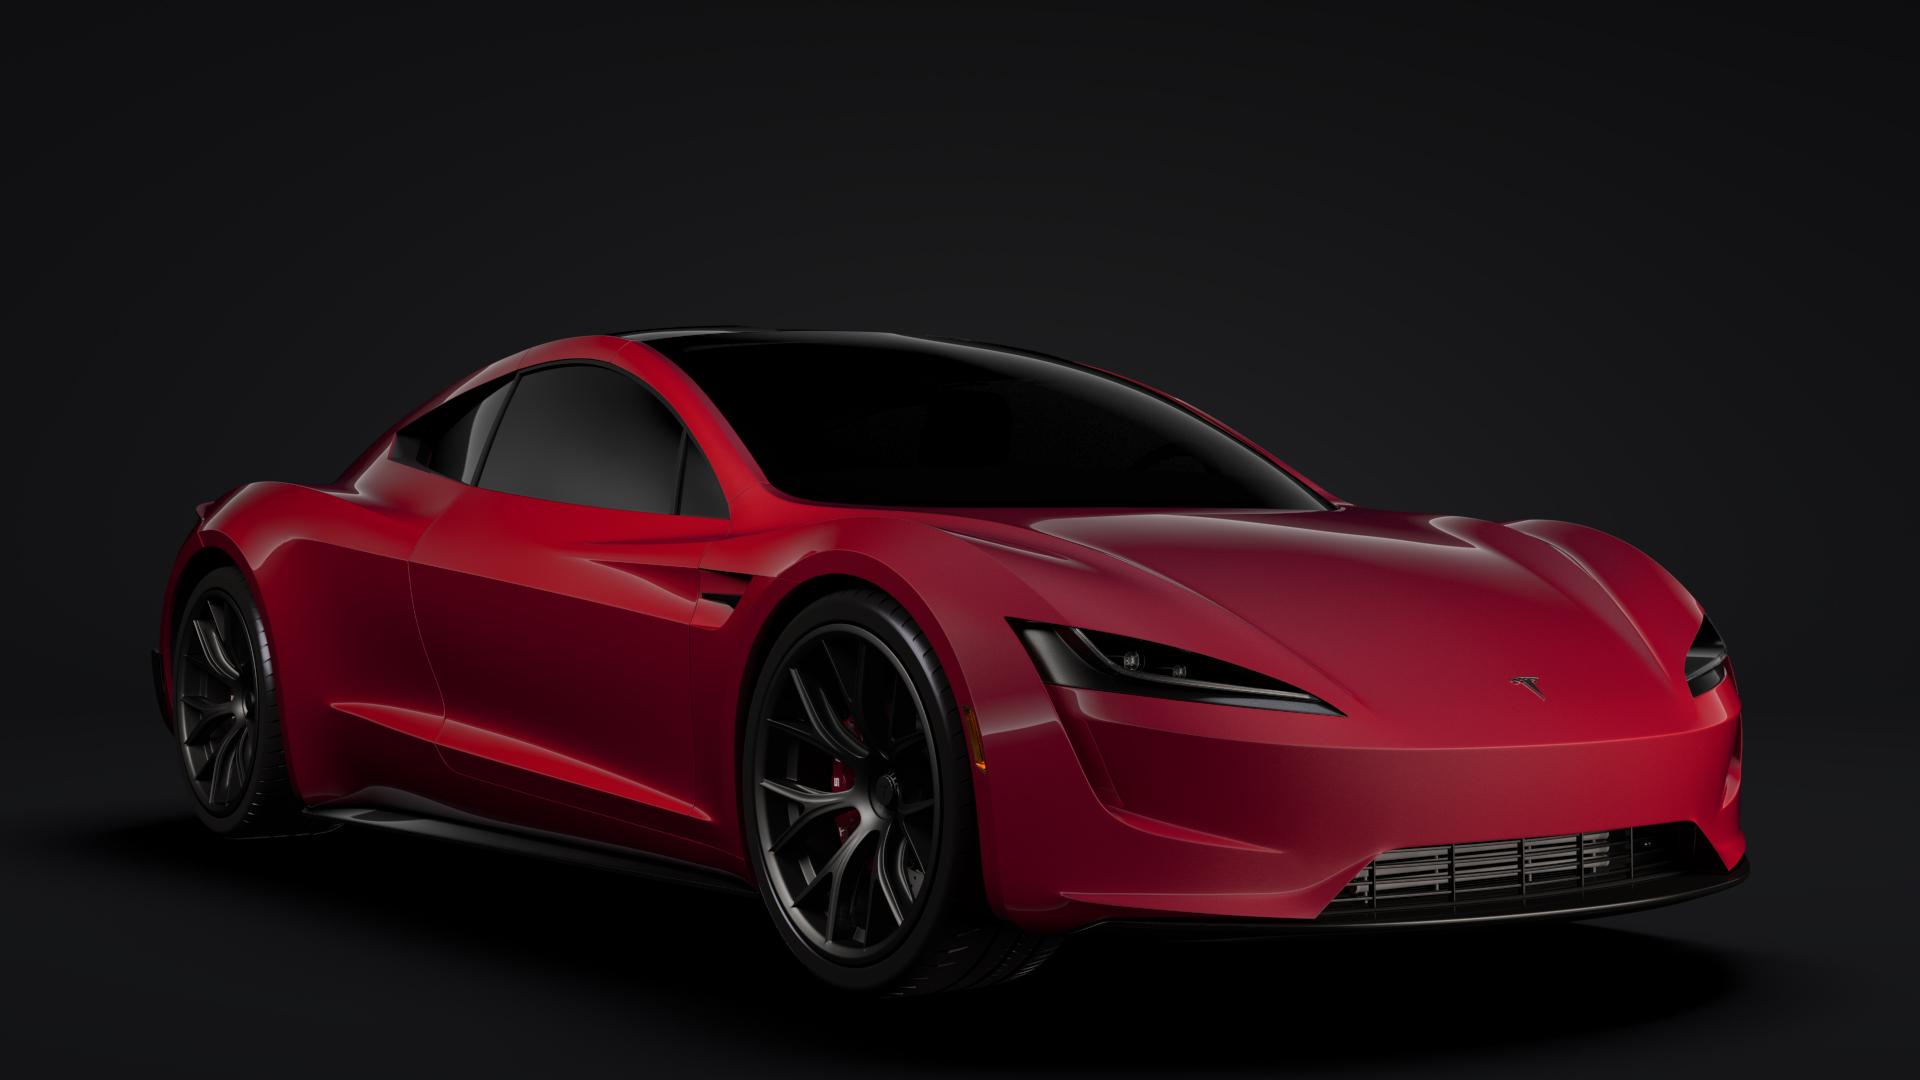 Tesla Roadster 2020 3d Model Buy Tesla Roadster 2020 3d